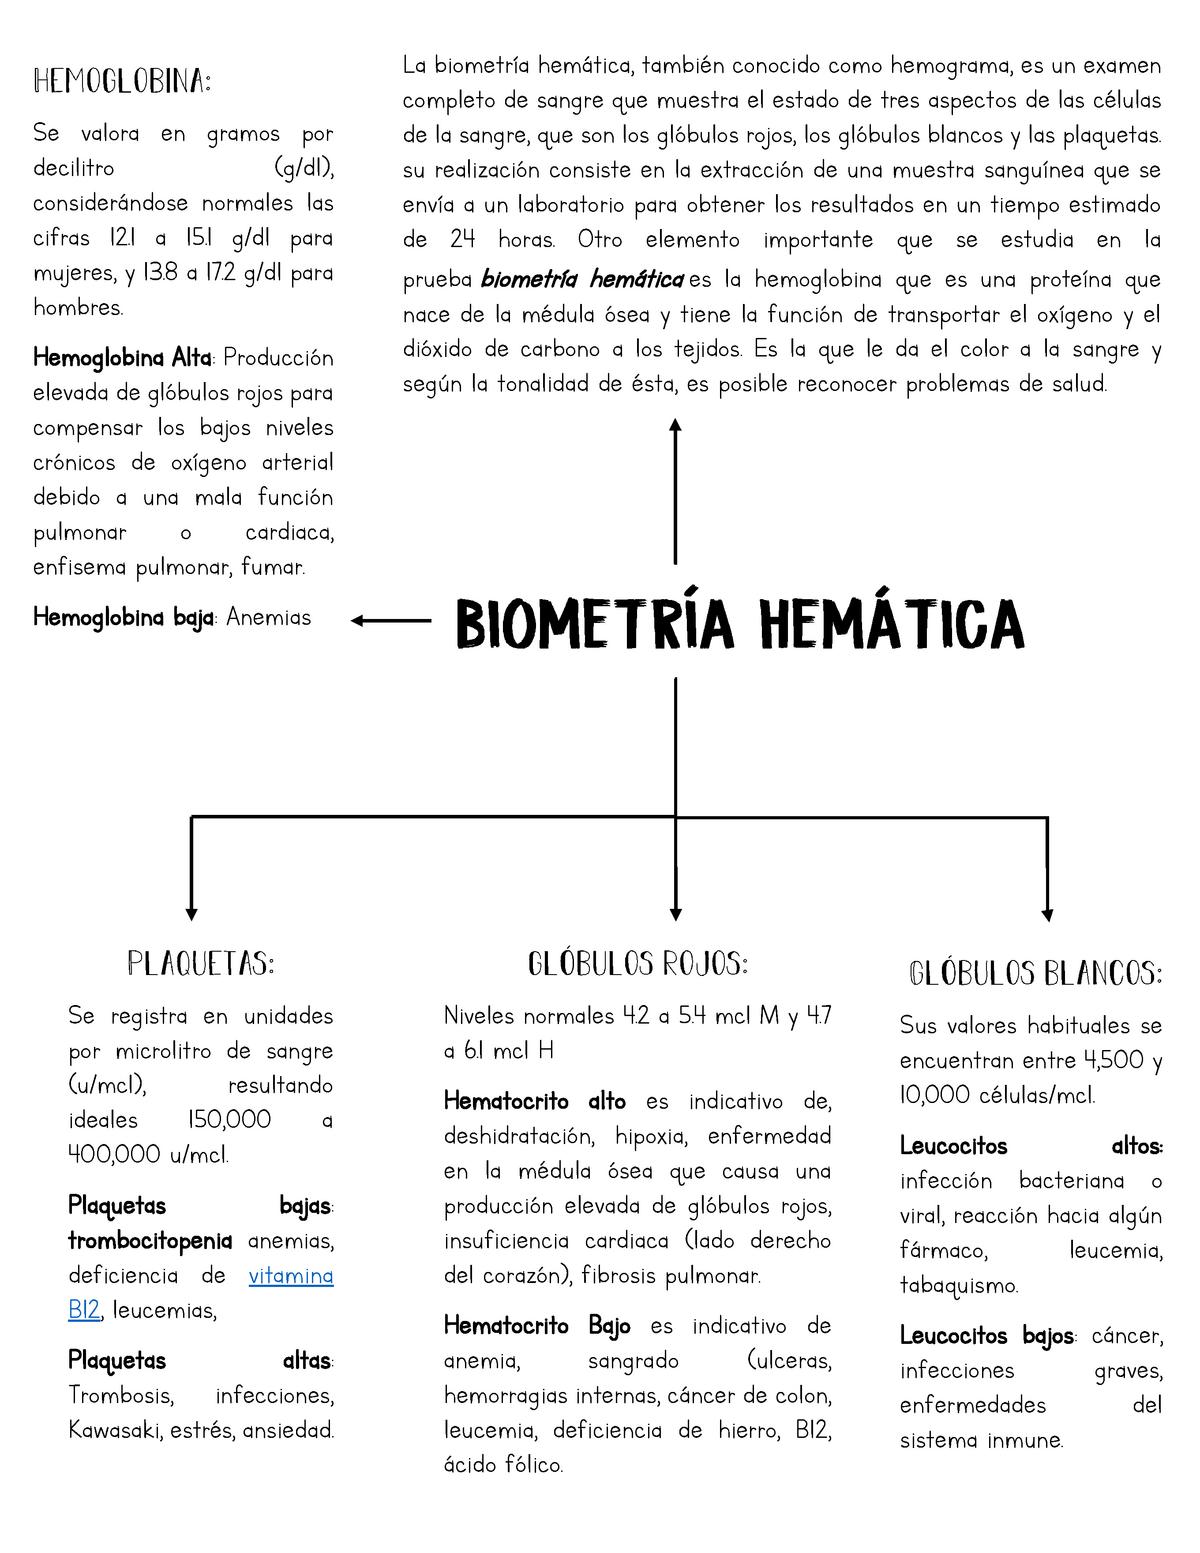 hemoglobina muerto linear unit los hombres